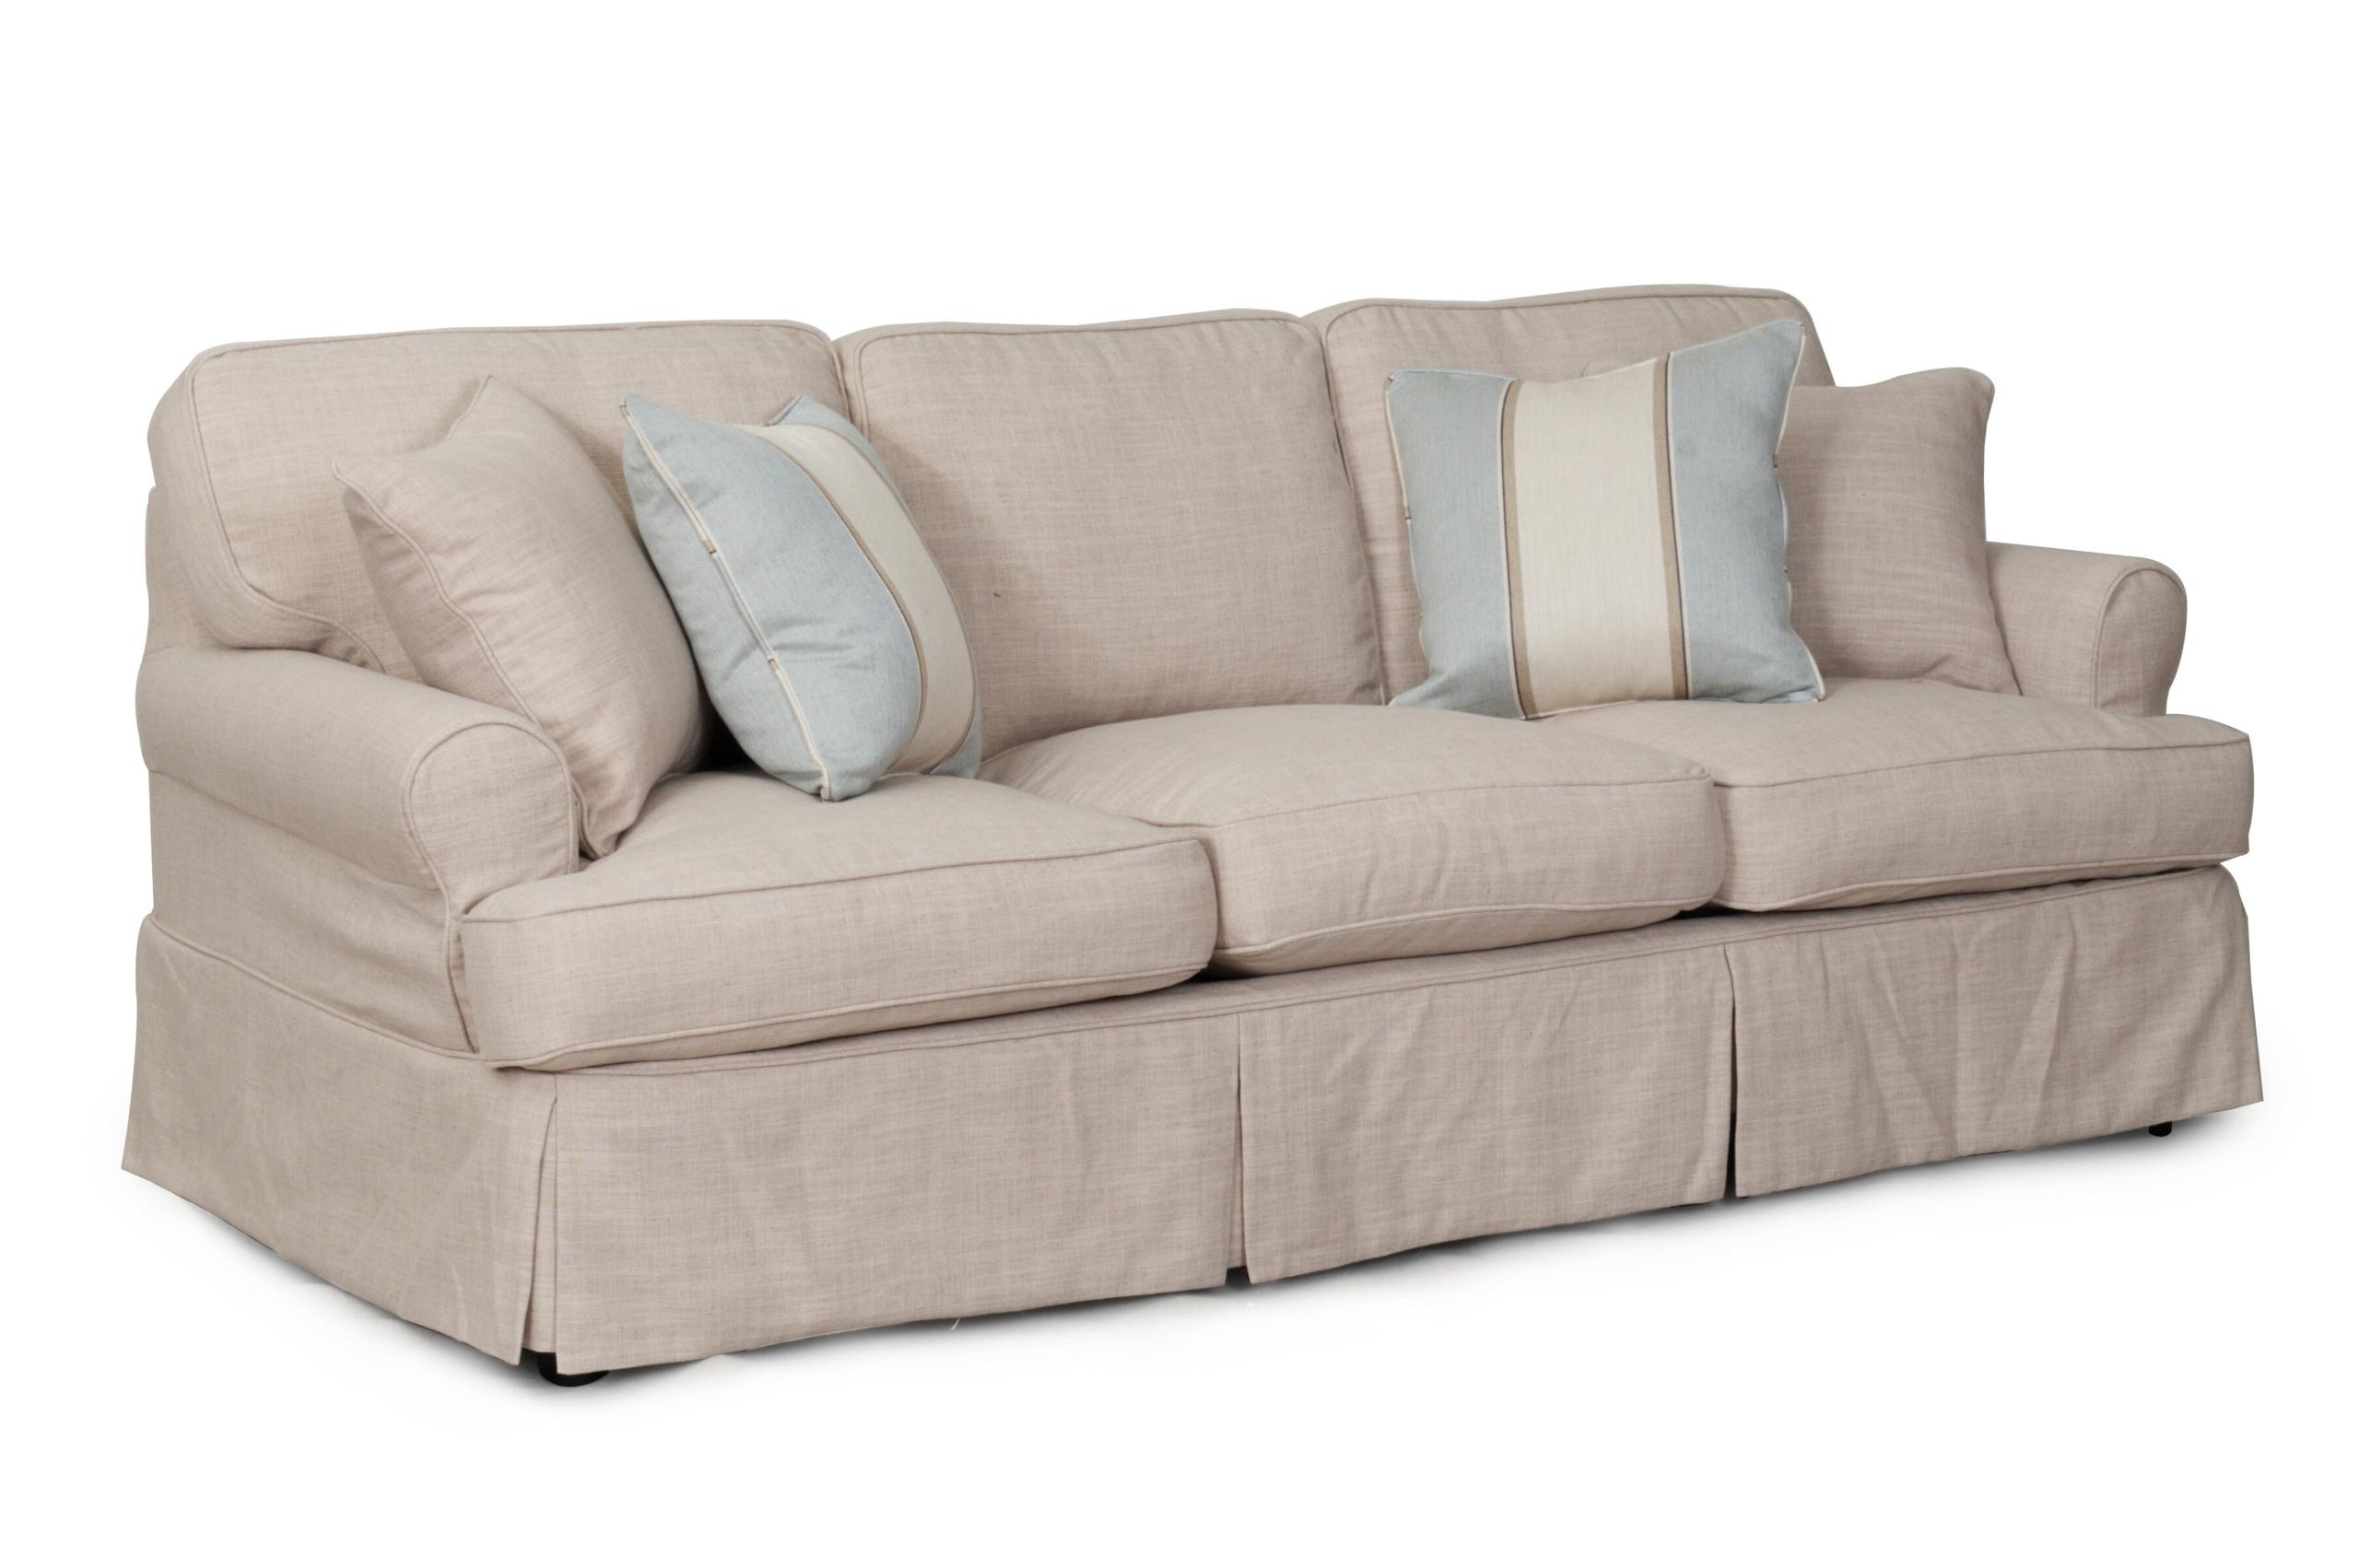 3 cushion sofa slipcover you ll love in